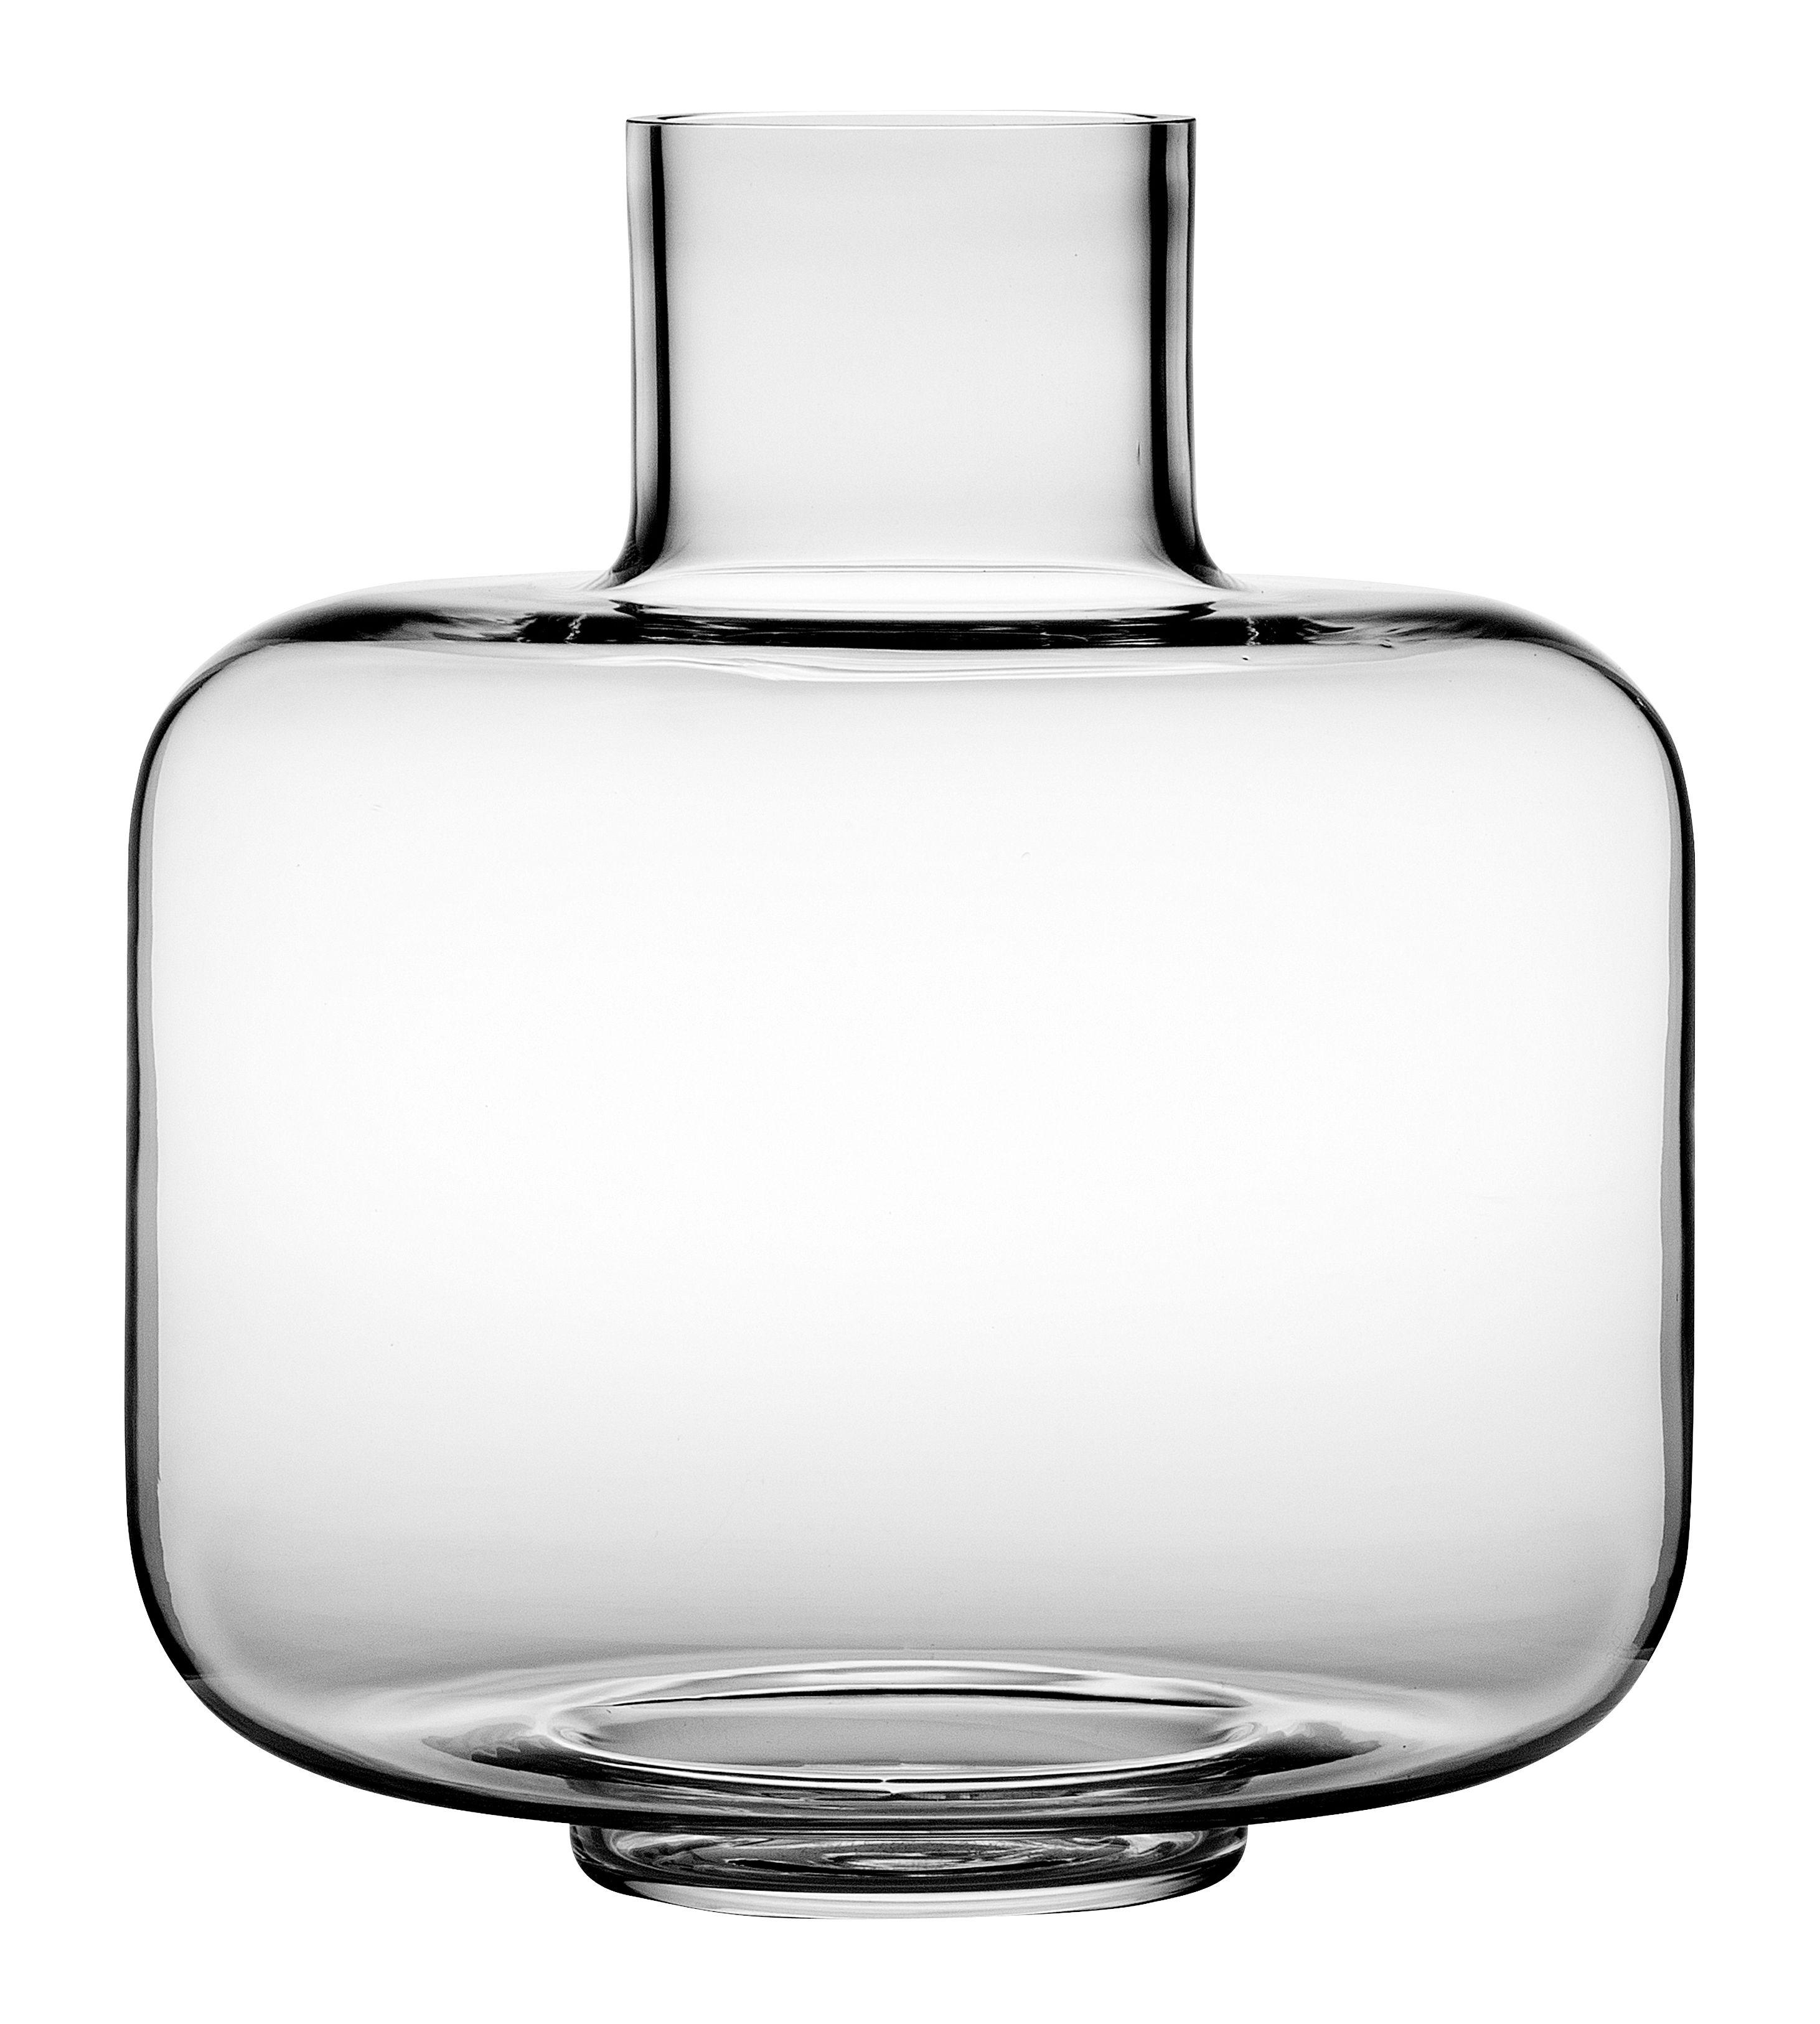 Dekoration - Vasen - Ming Vase / Glas - Ø 22 cm x H 24 cm - Marimekko - Transparent - mundgeblasenes Glas